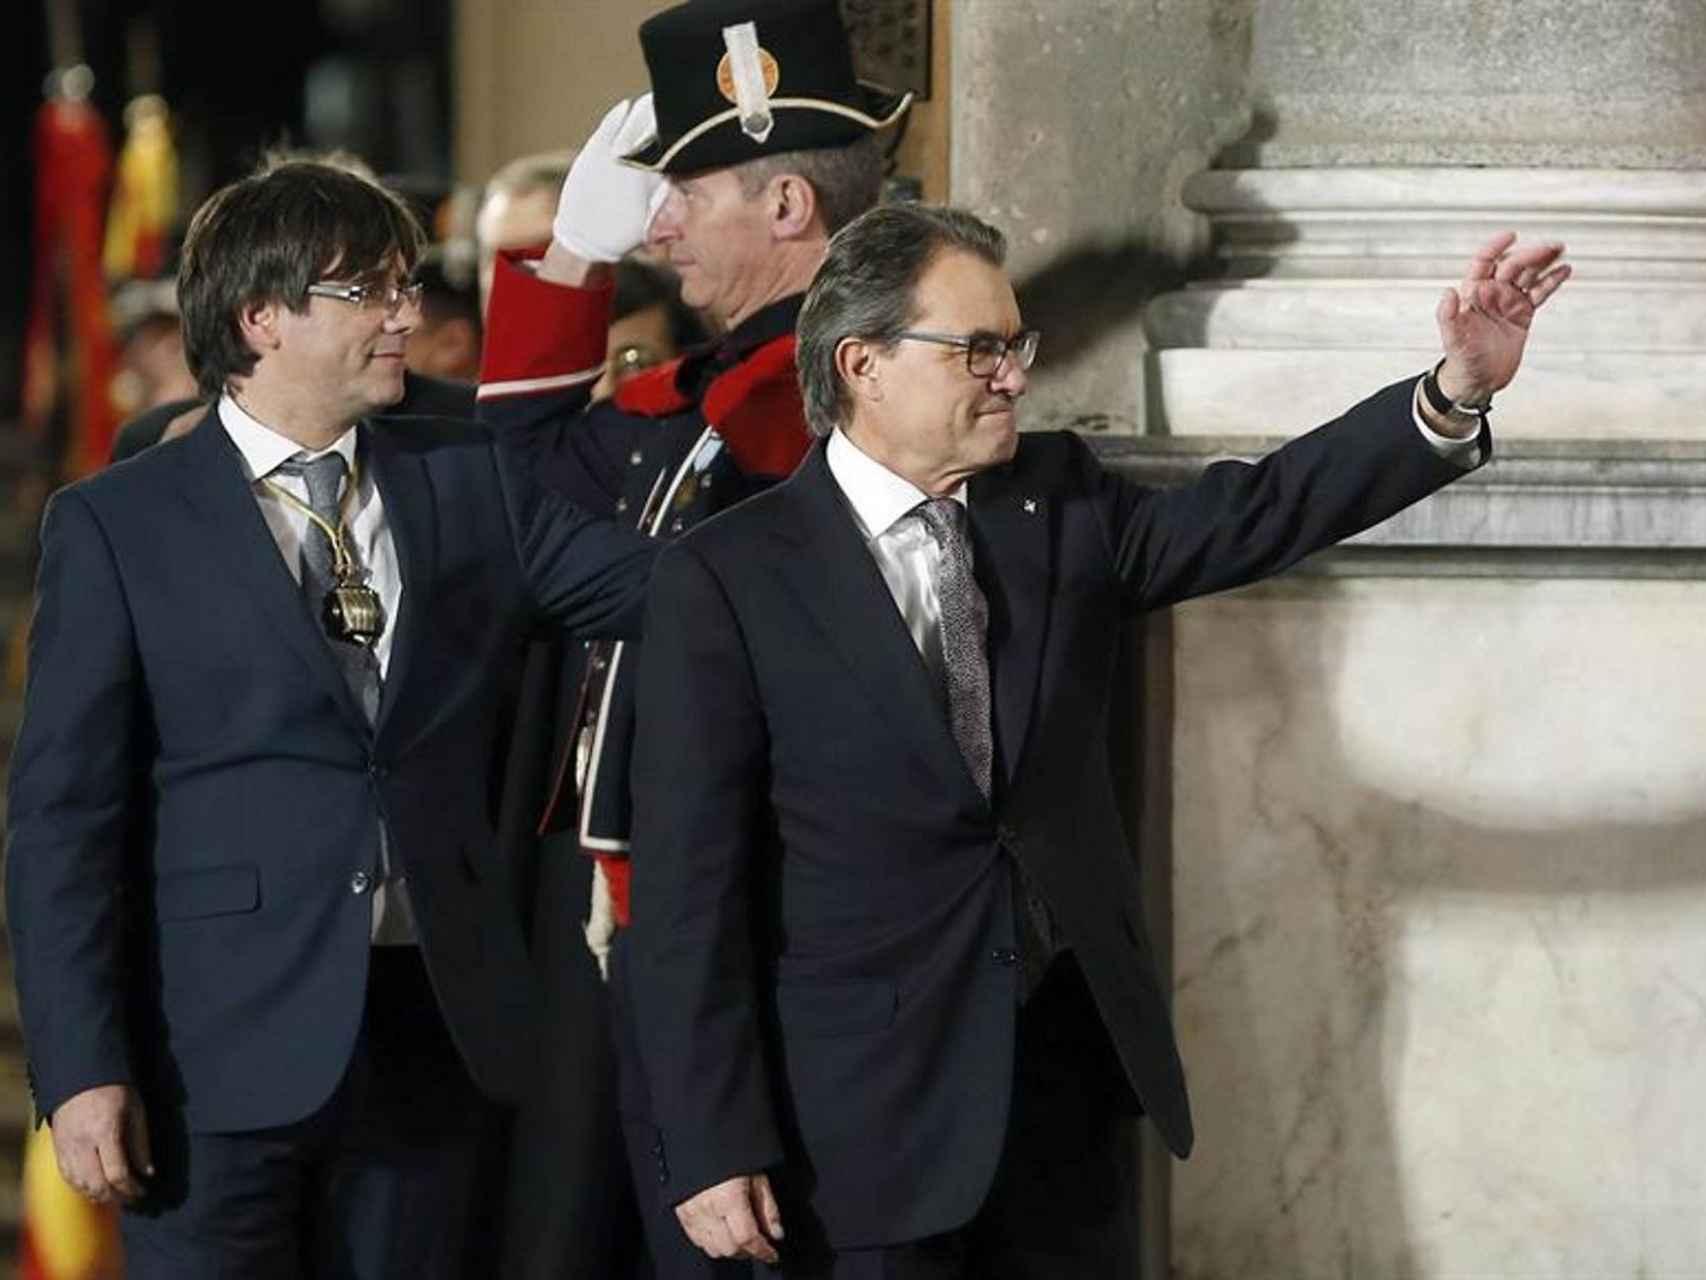 Toma de posesión de Carles Puigdemont//Andreu Dalmau/EFE